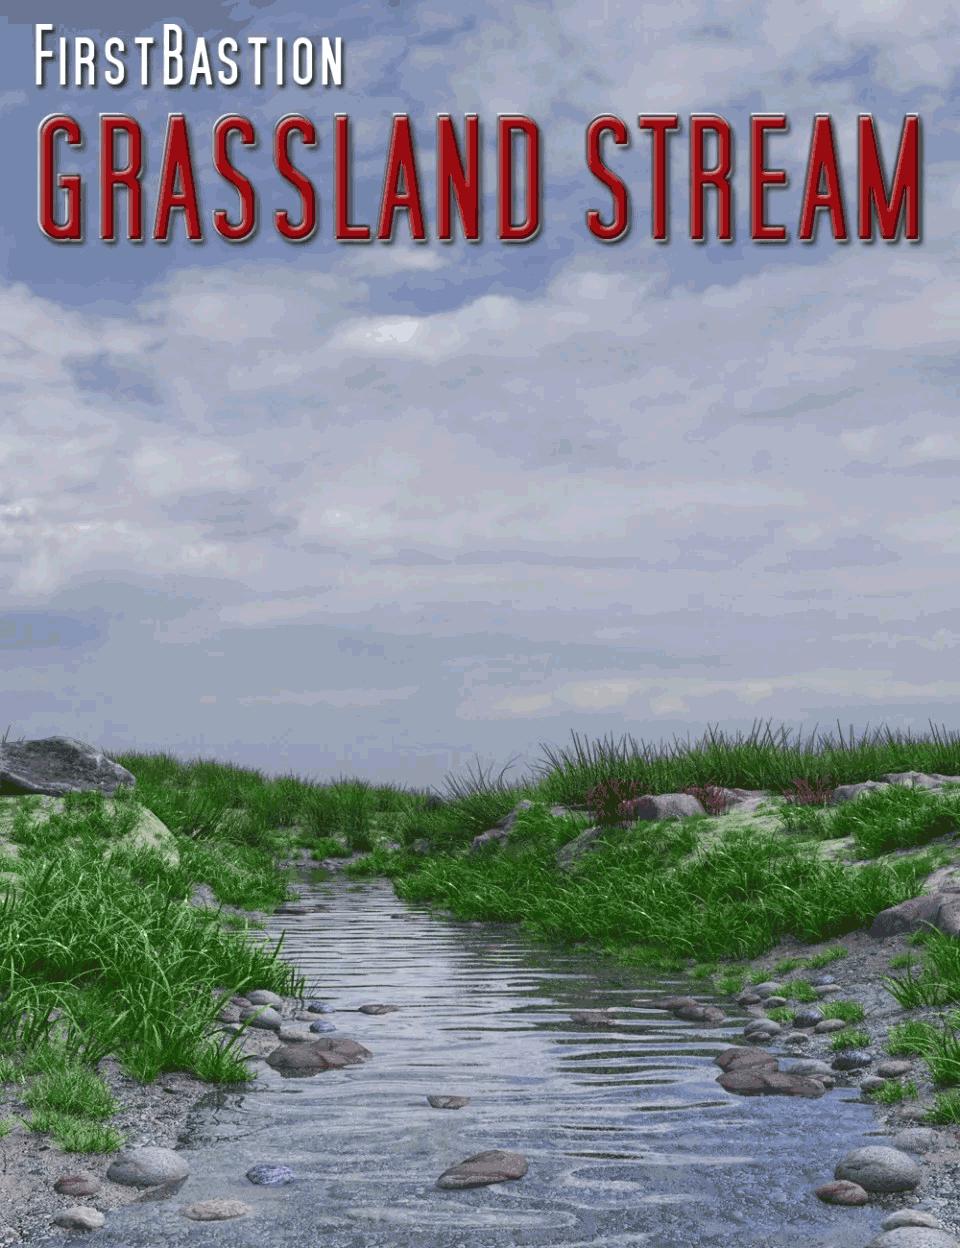 1stB Grassland Stream